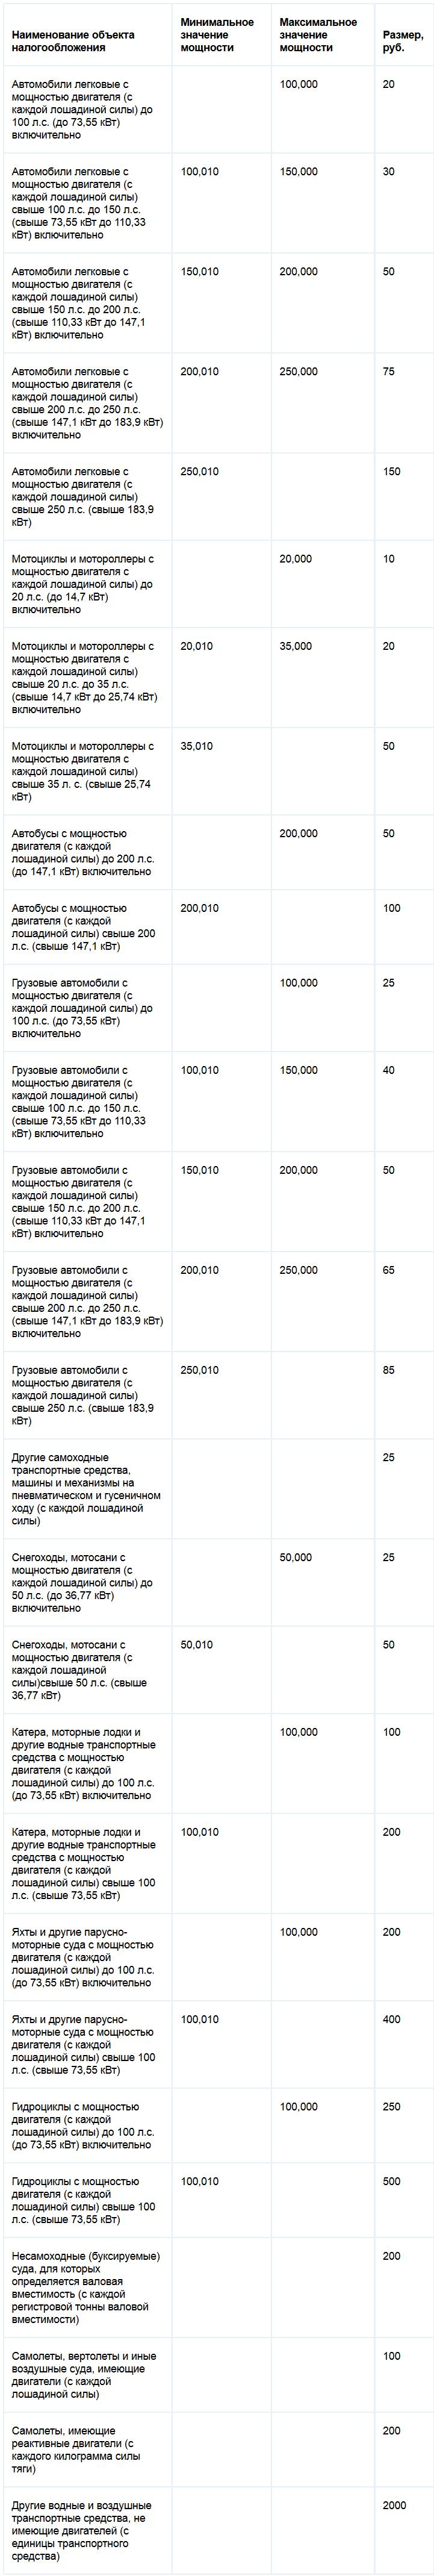 Ставки транспортного налога Тамбовской области